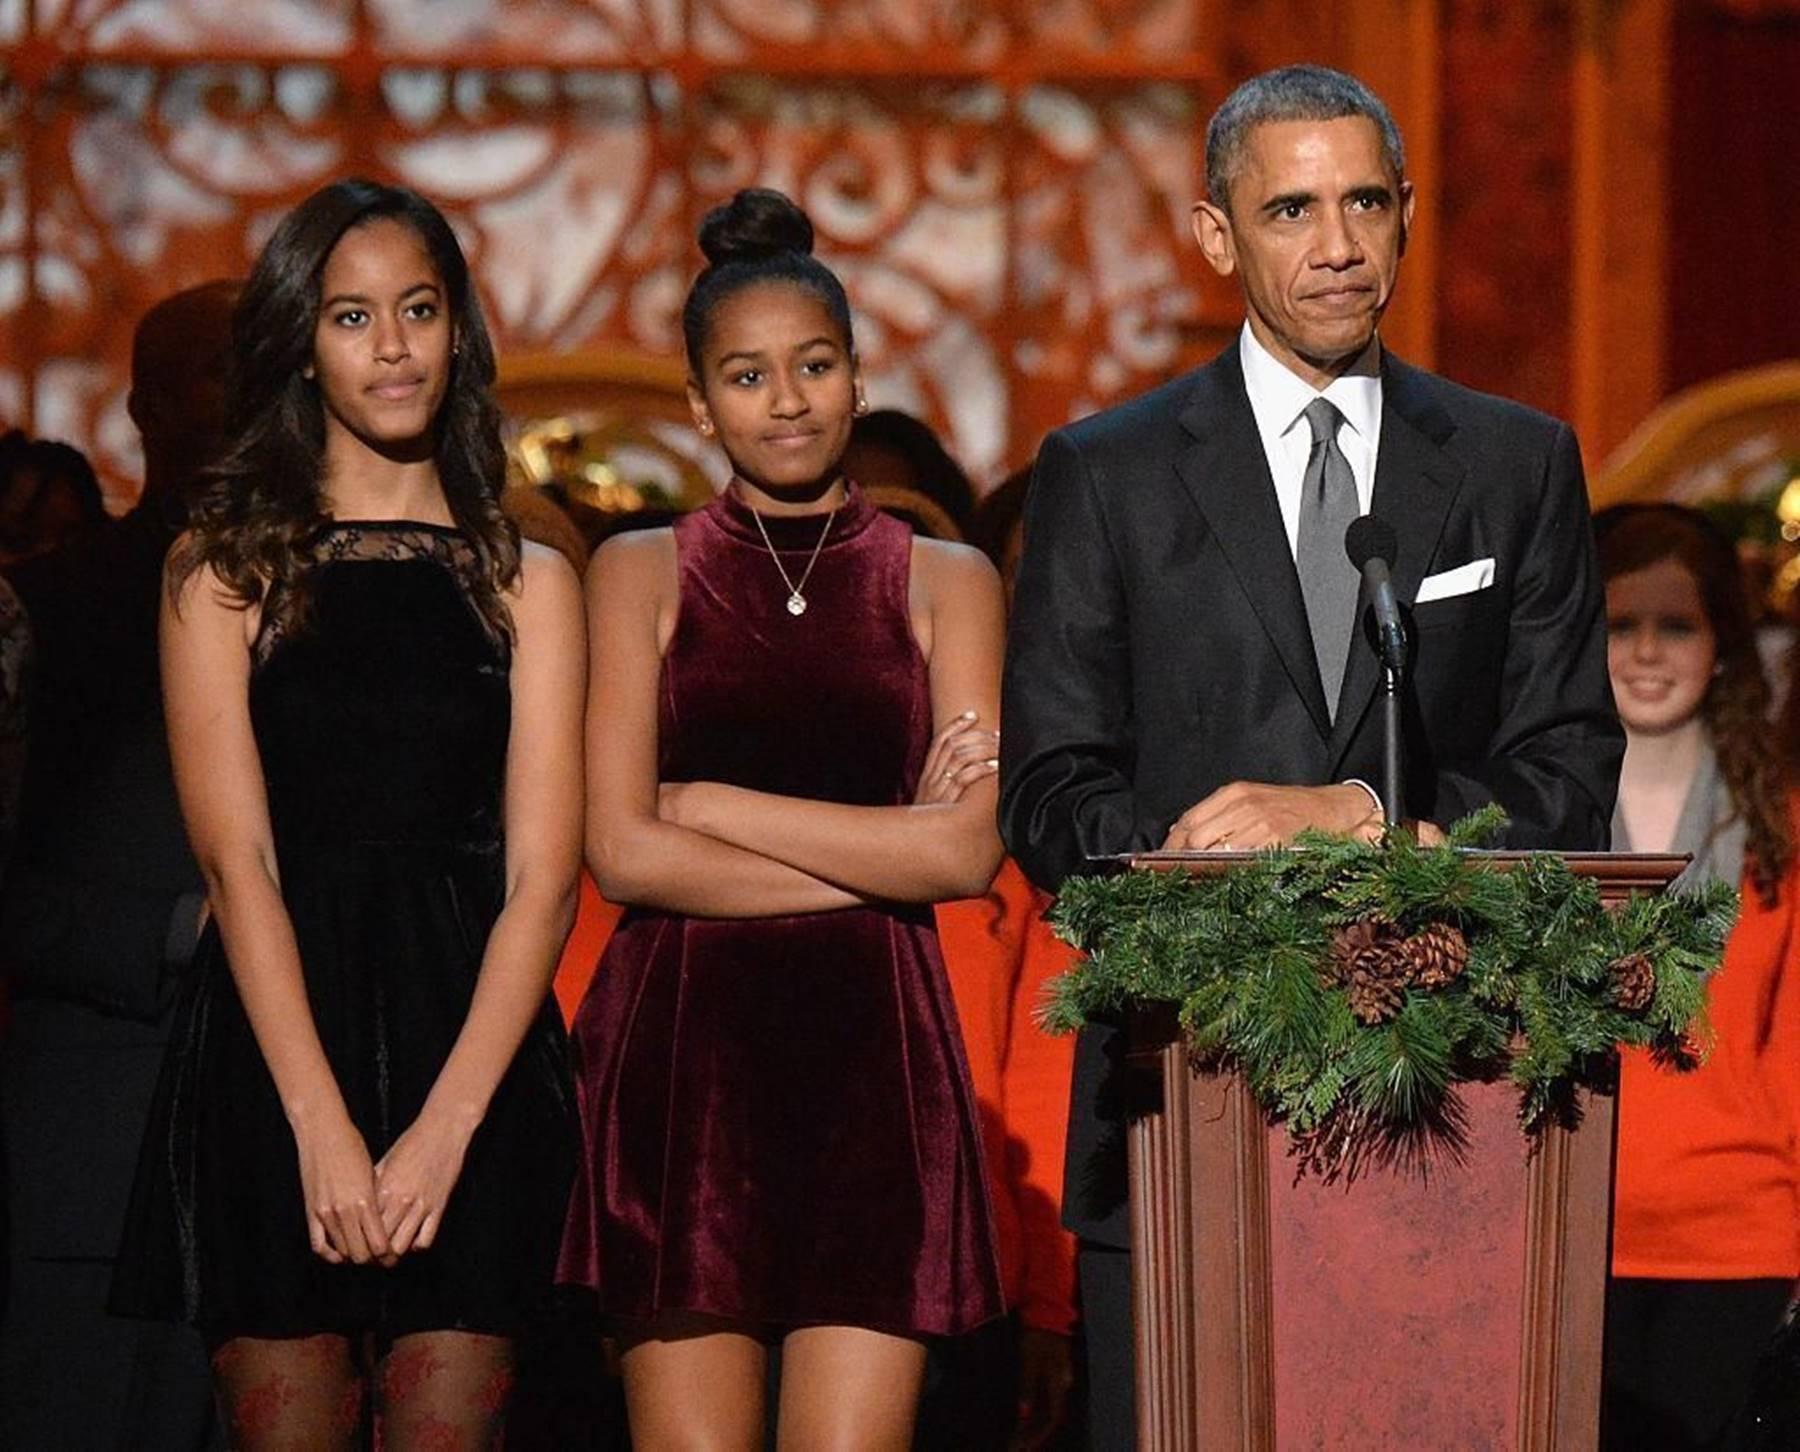 Barack Obama's Daughter Sasha Reveals Her University Pick ...